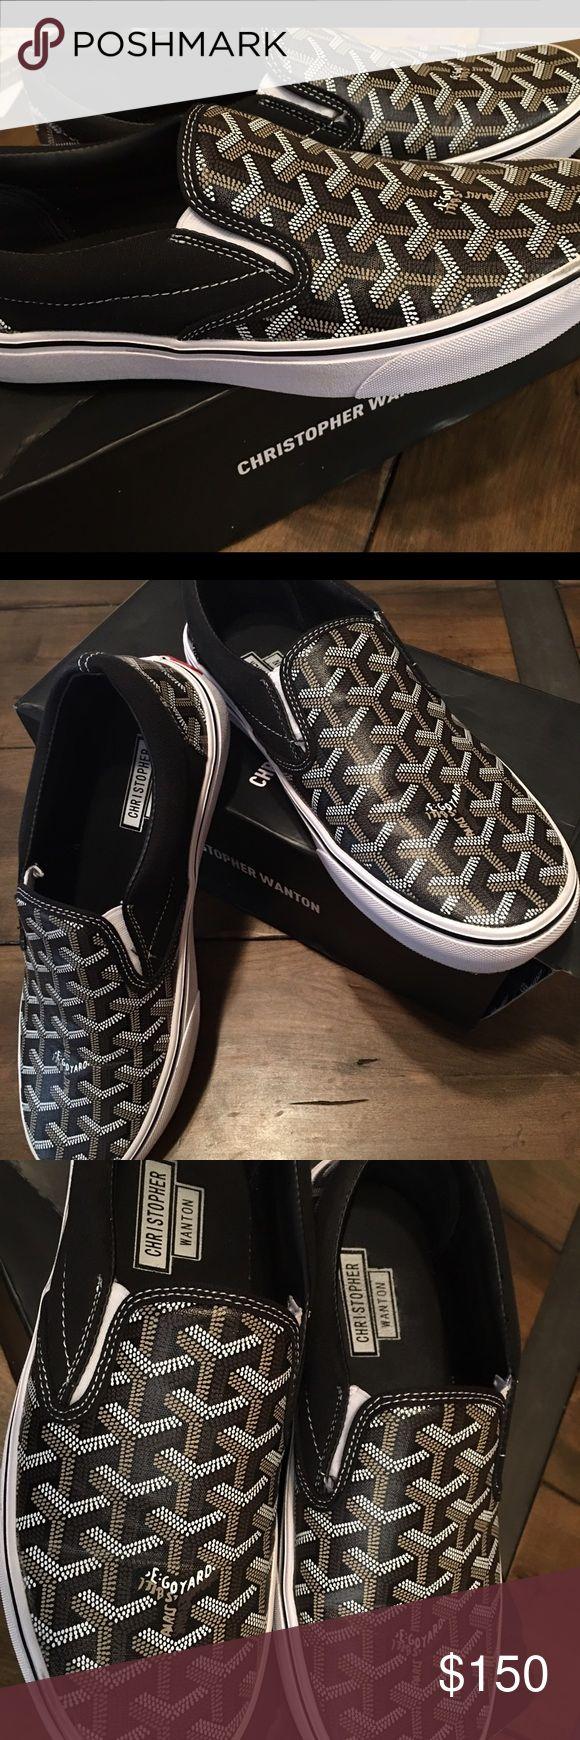 Goyard Vans Christopher Wanton Used ones Goyard Vans unisex 8.5 Mens 10 Womens. Comes with original box Goyard Shoes Sneakers